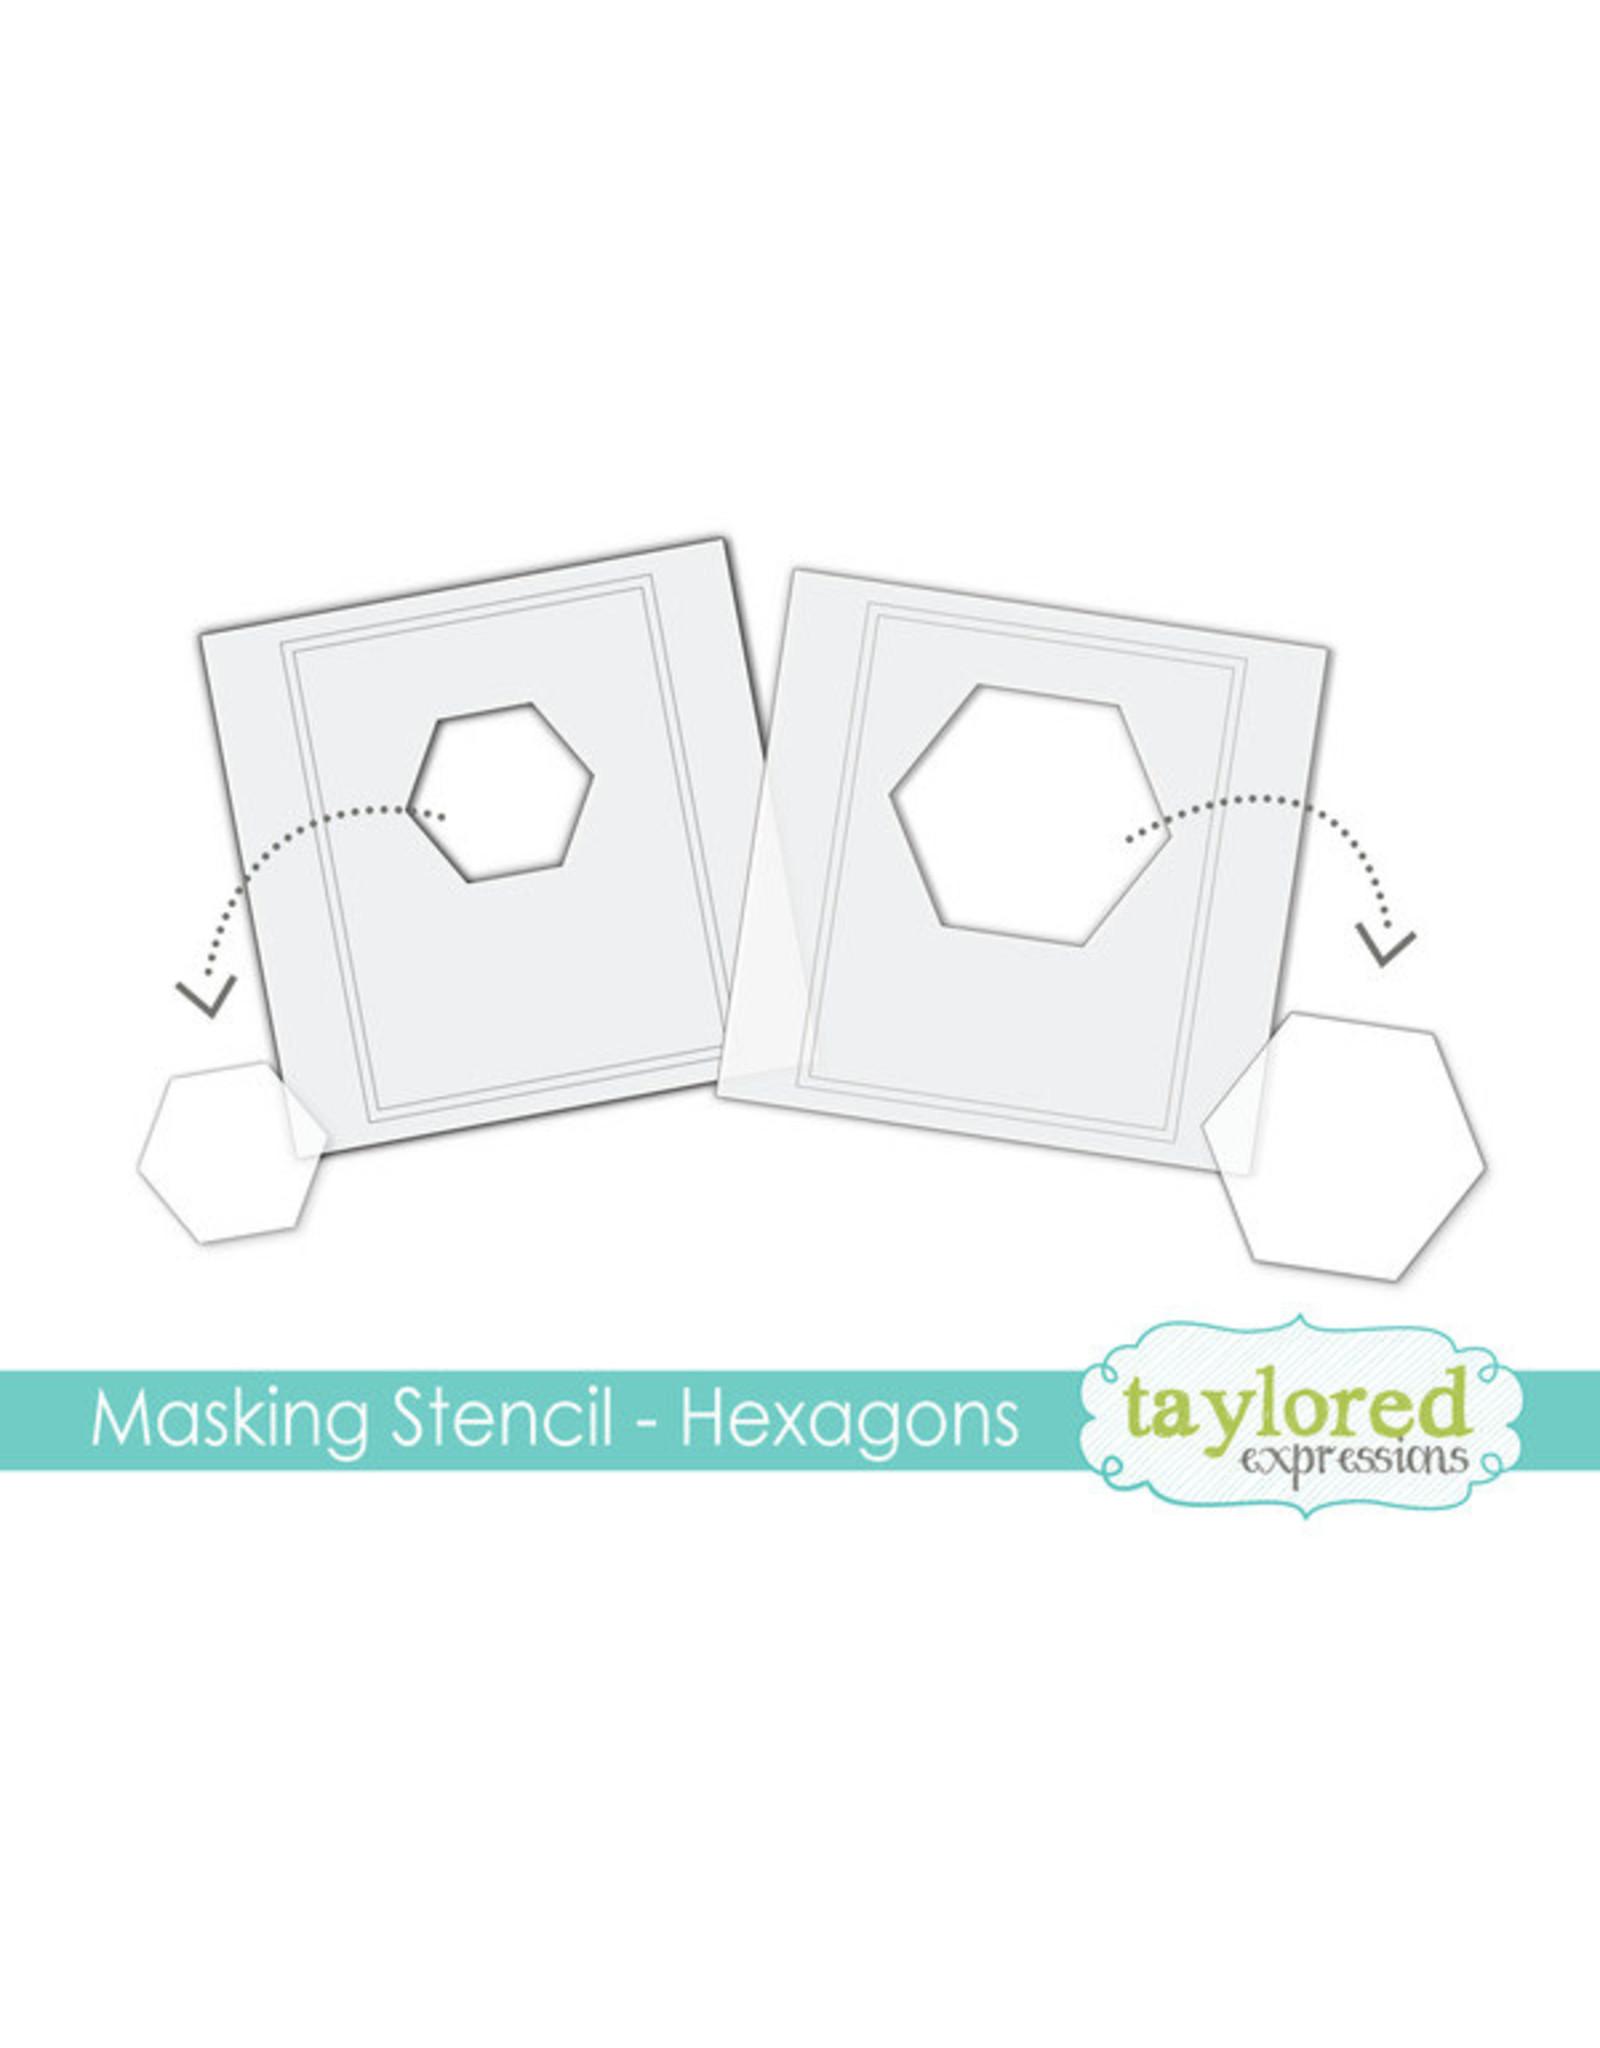 Taylored Expressions Hexagons - 6x6 Designer Masking Stencil